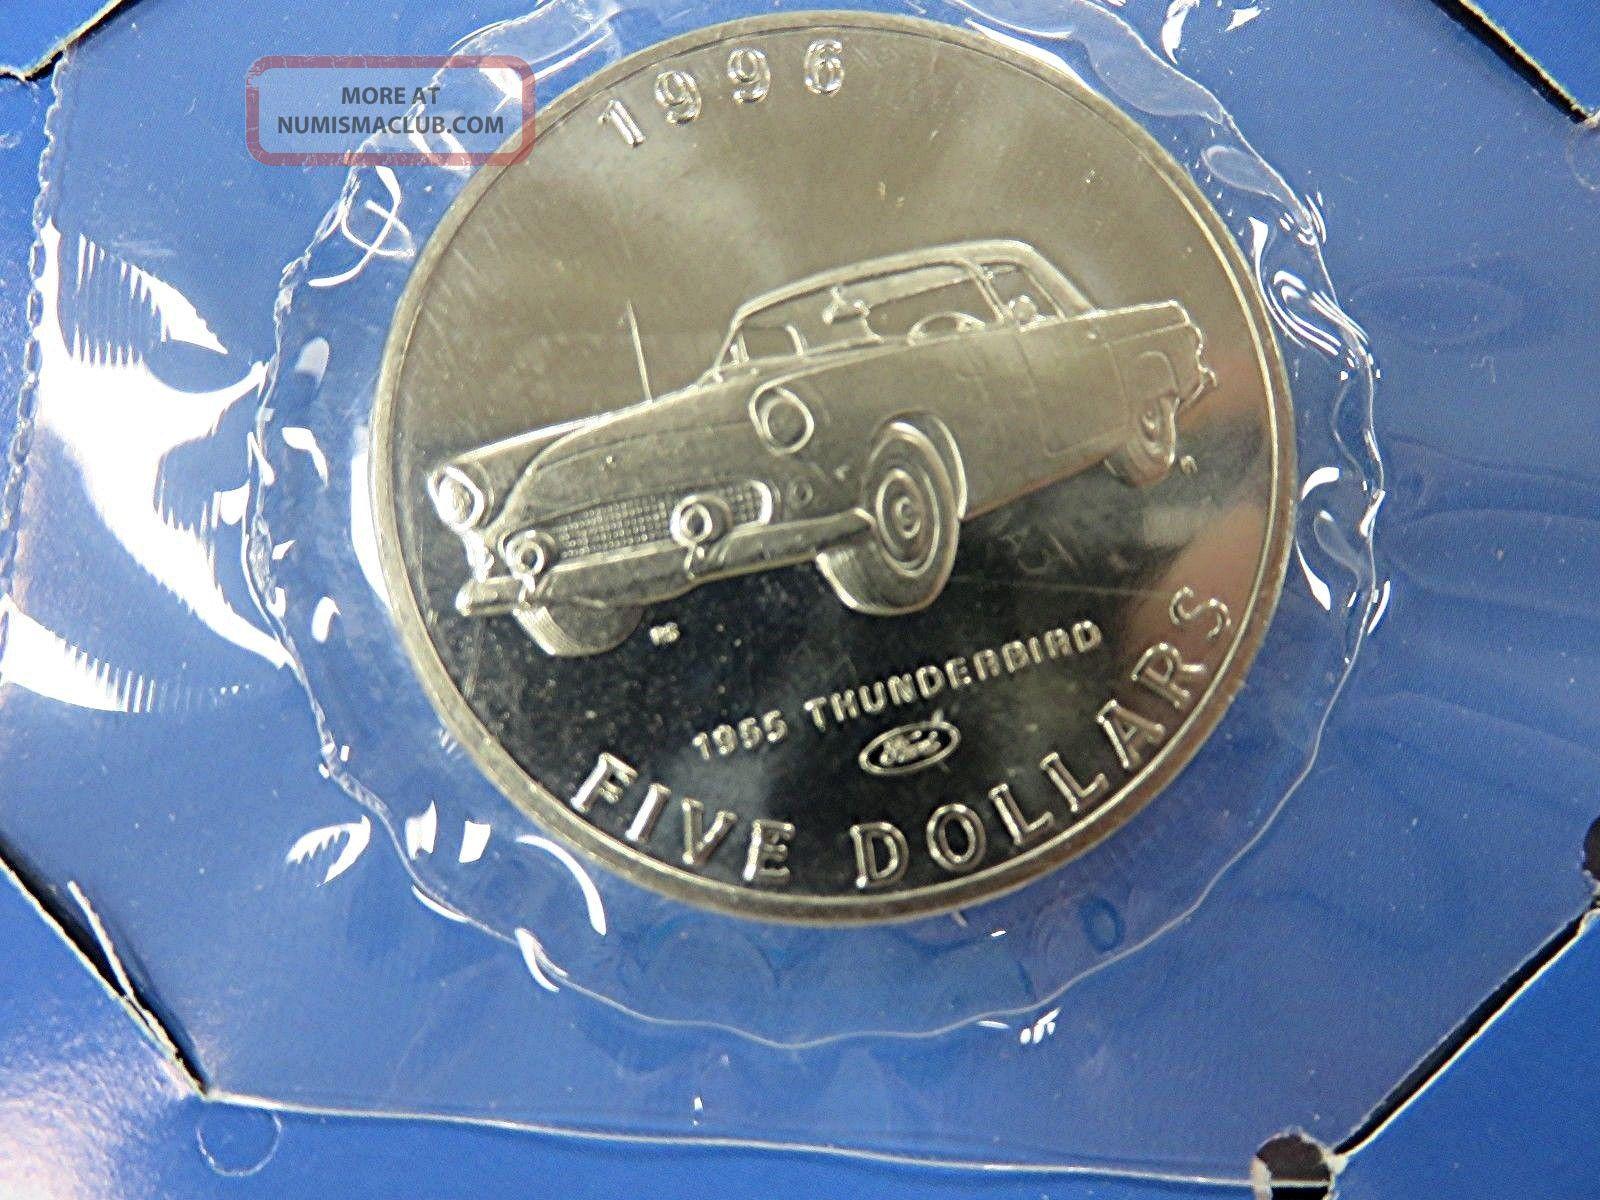 1996 Marshall Islands - 5 Dollars - 1955 Ford Thunderbird - Bu - Orig.  Pkg Coins: World photo